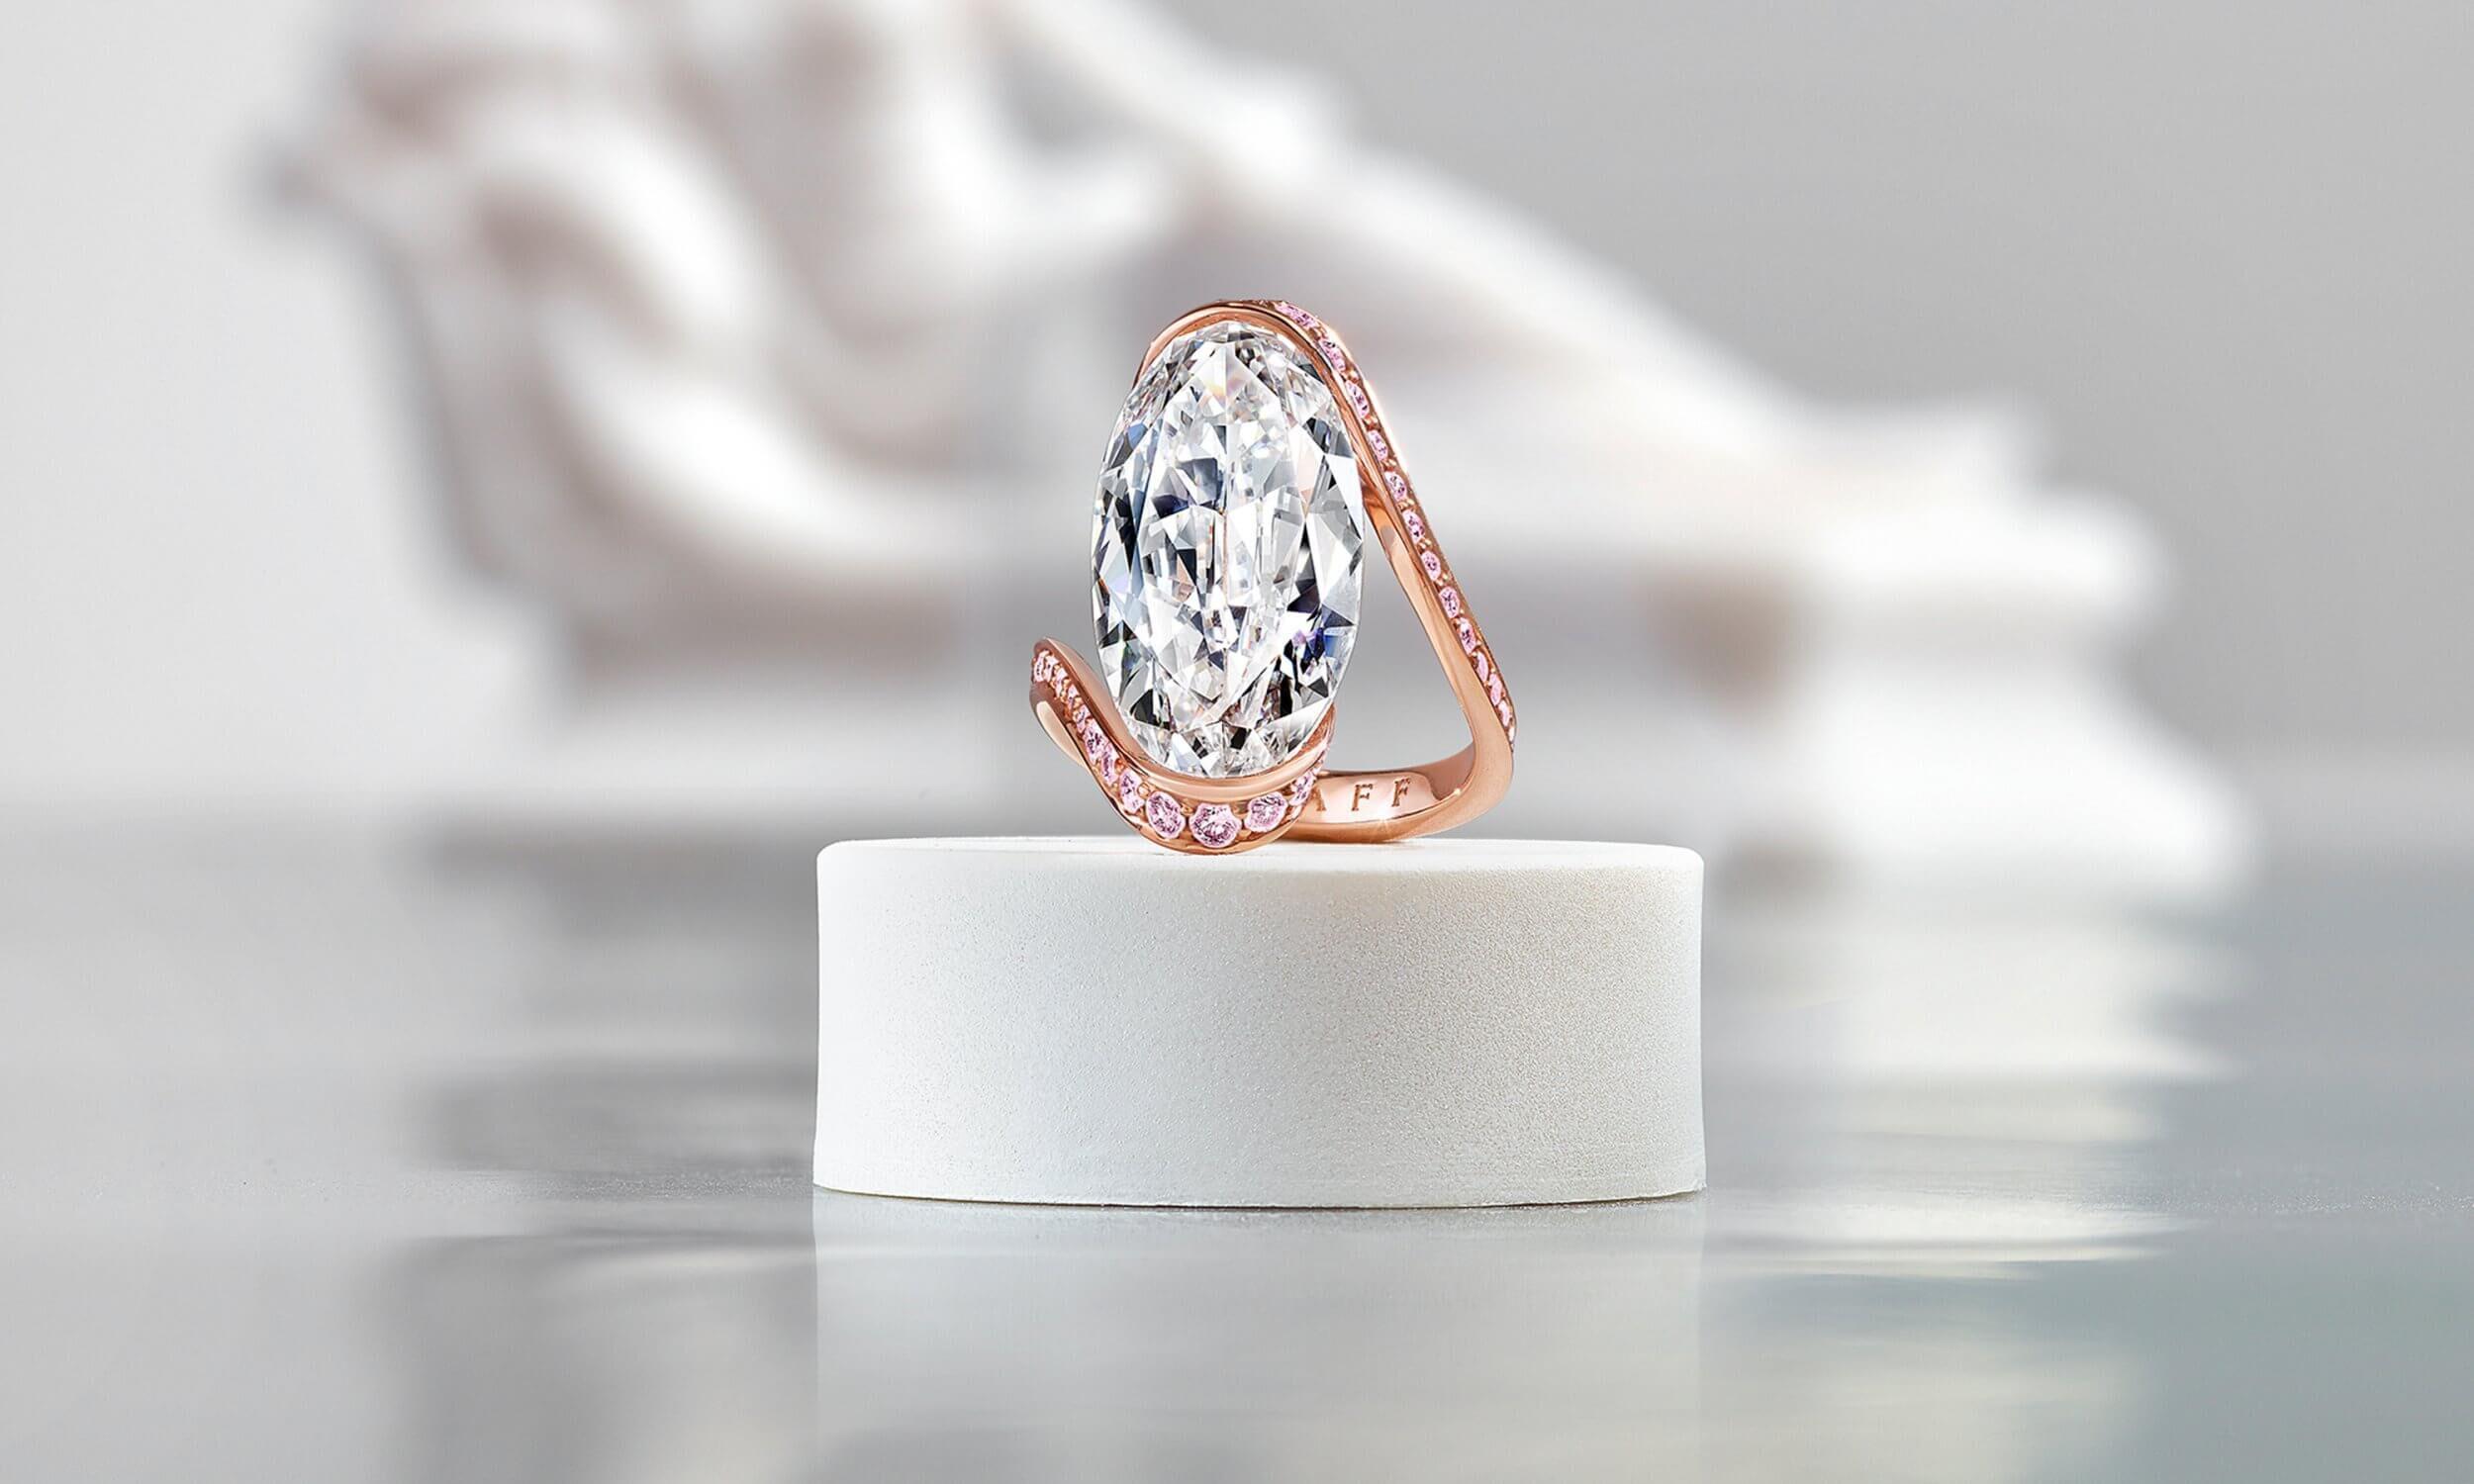 Graff D Internally Flawless White Oval Diamond High Jewellery Ring With Pink Pave Diamond Swirl Surround inside a Gallery